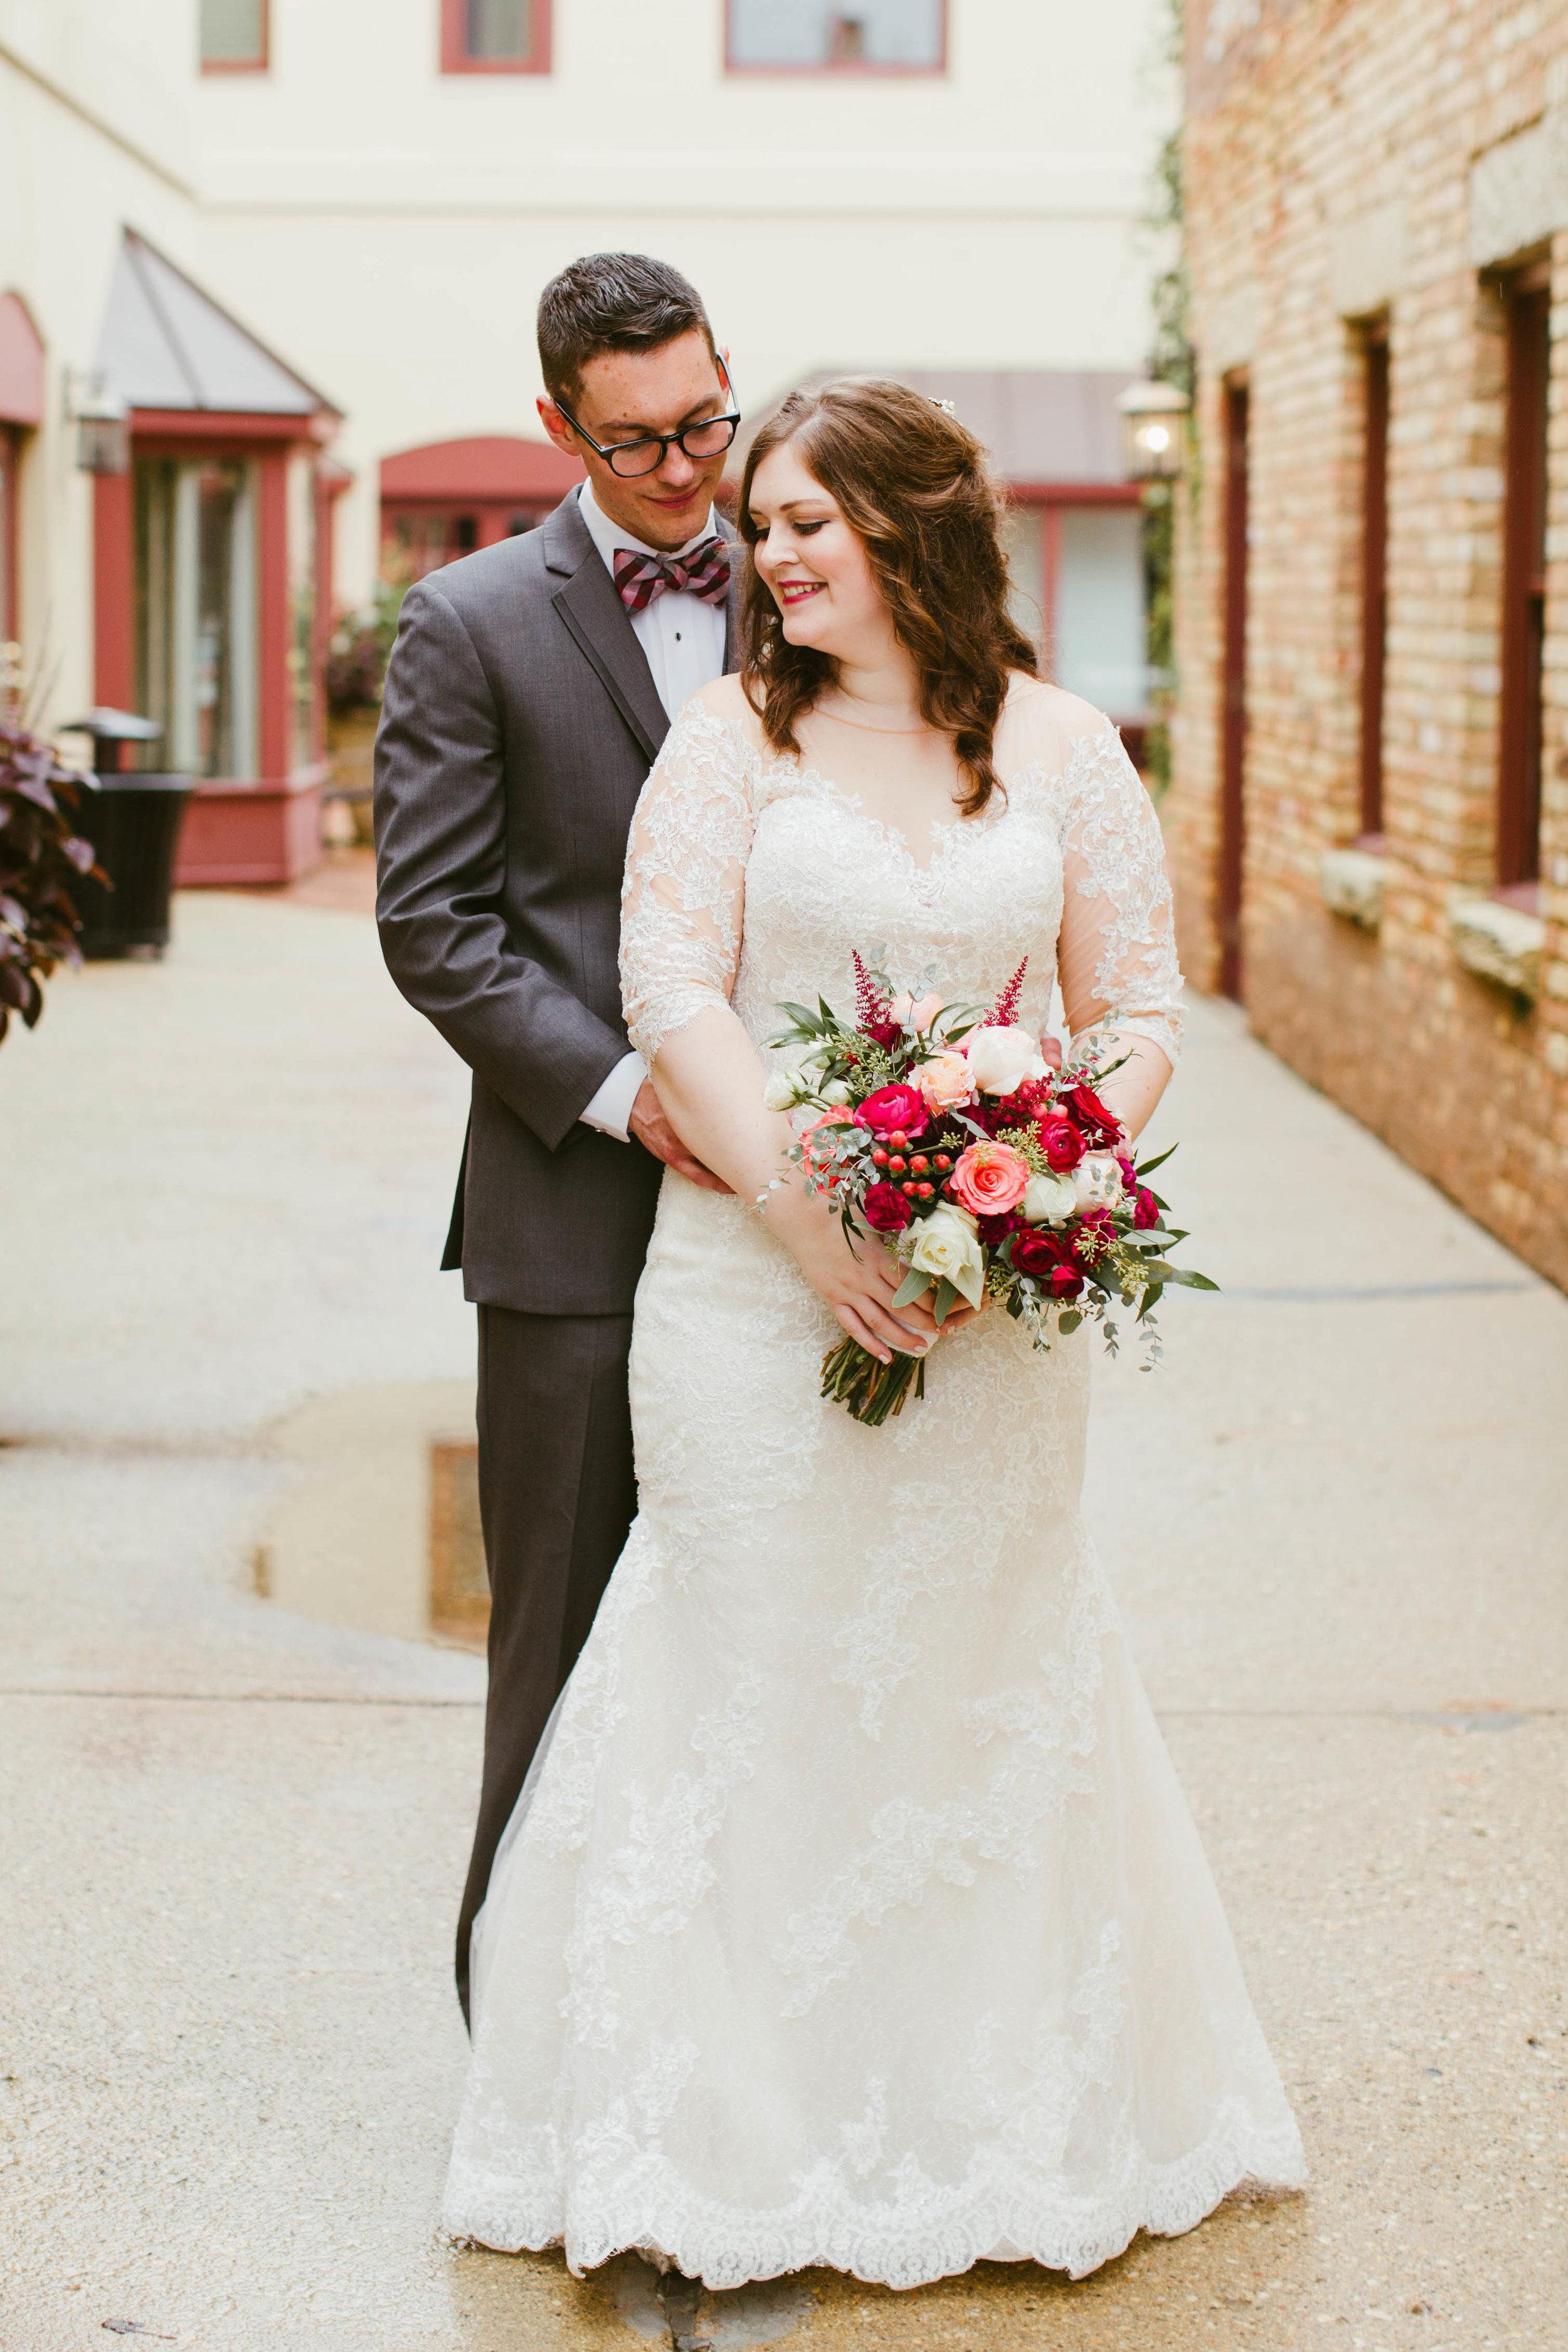 jennahazelphotography-marcy+ben-wedding-0586.jpg